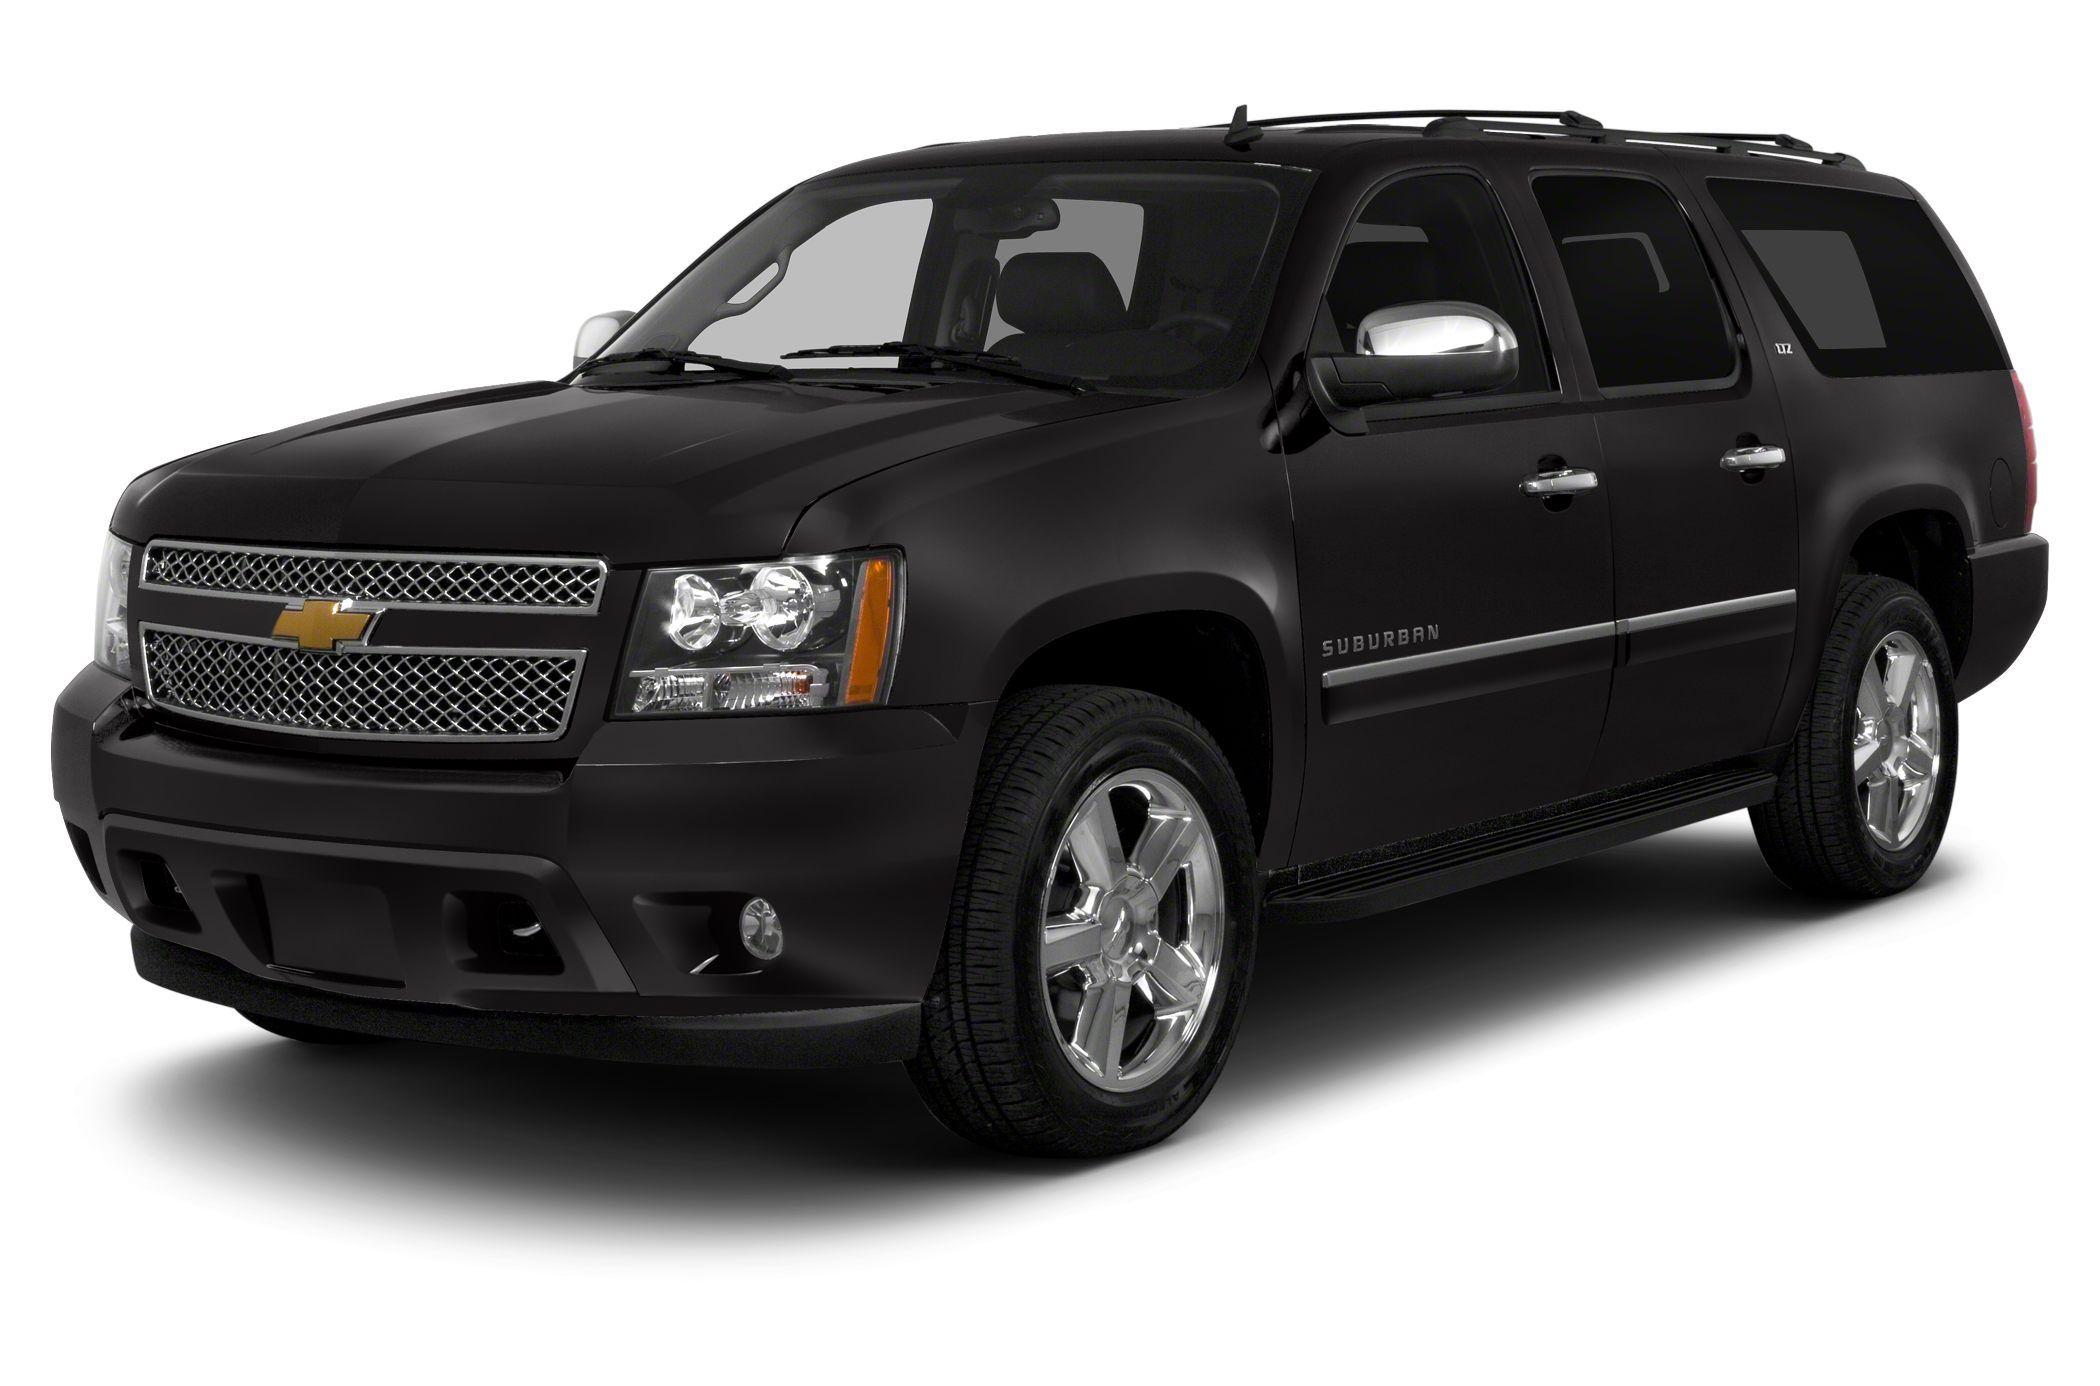 Cool Chevy Suburban Wiki Chevrolet Automotive Design